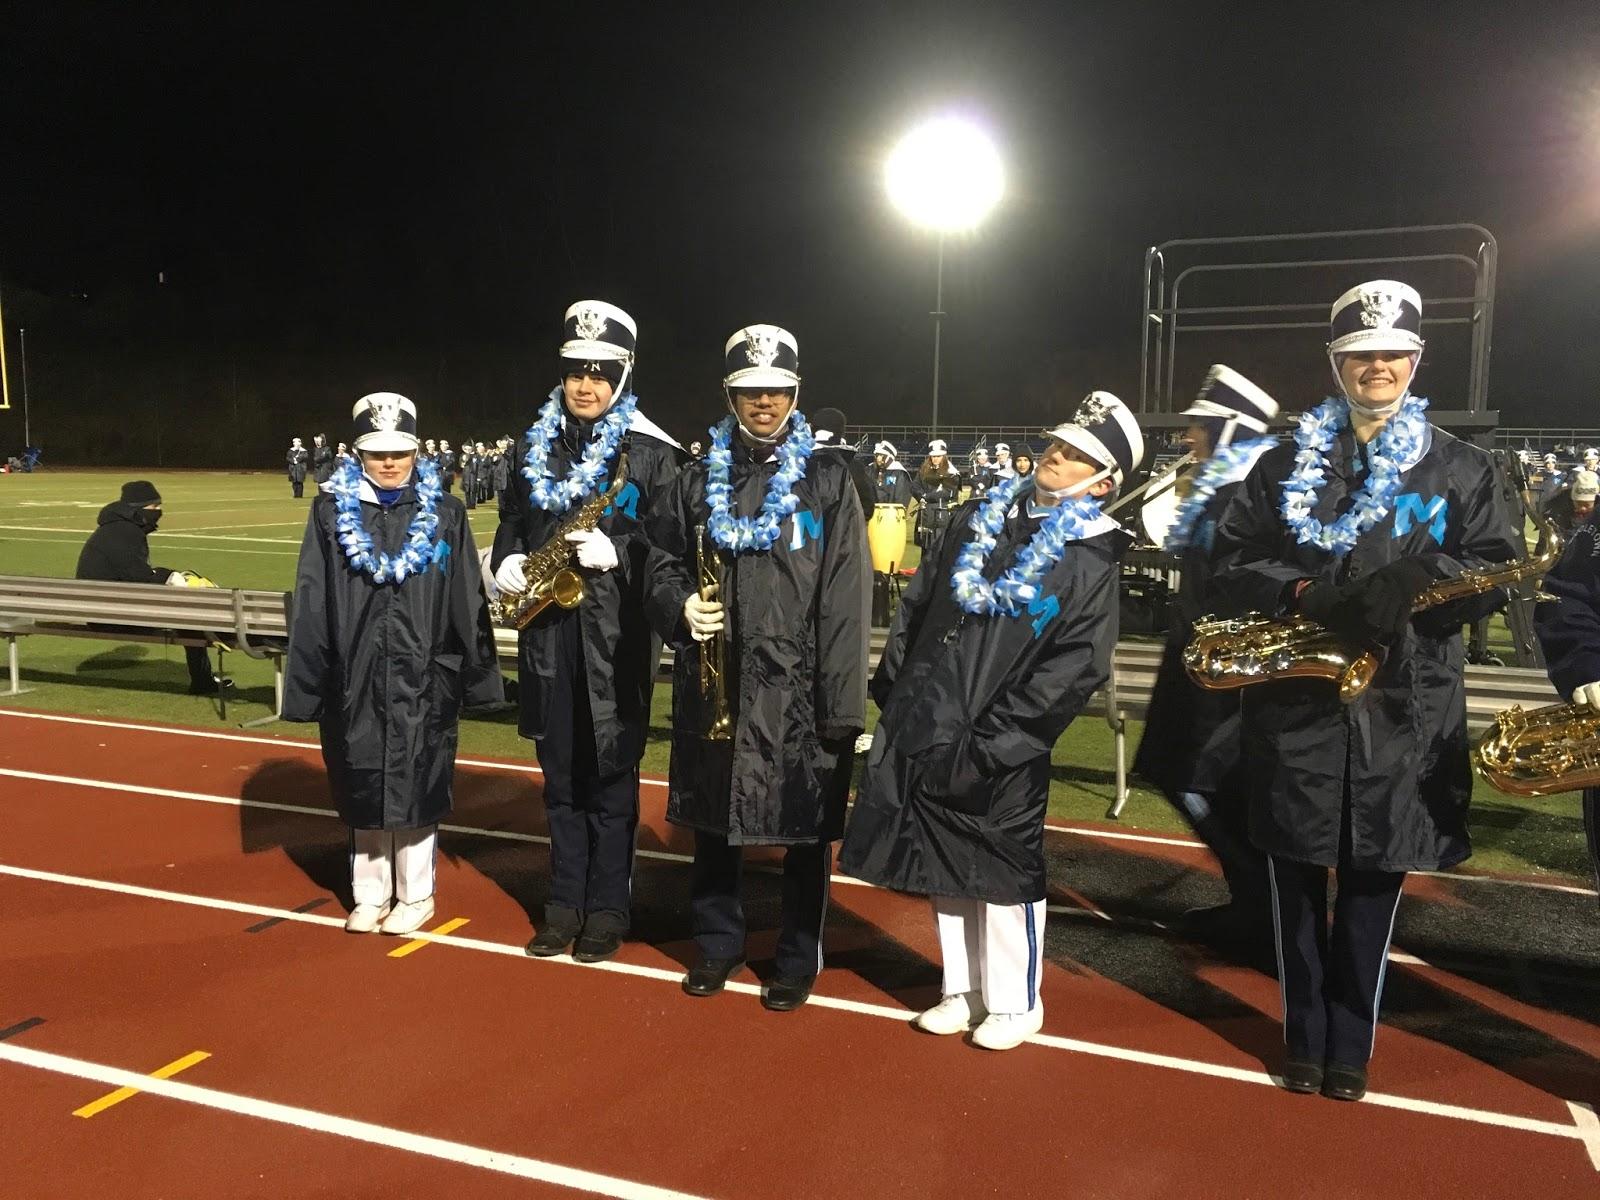 Middletown High School Bands Football Game Senior Night!